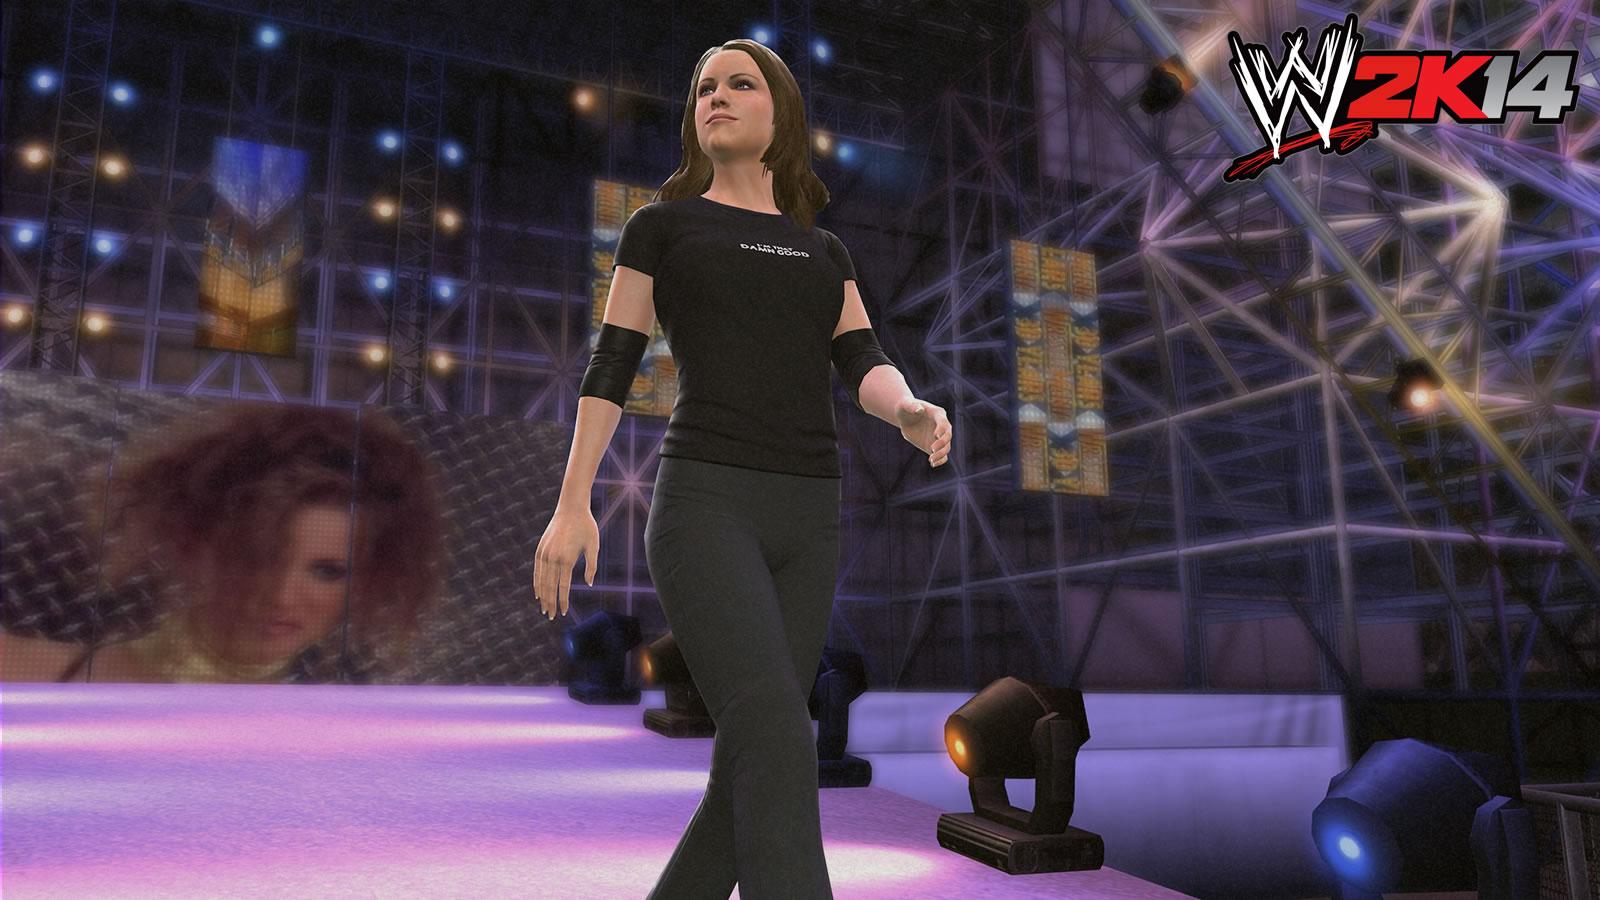 image - wwe 2k14 screenshot.111   pro wrestling   fandom powered